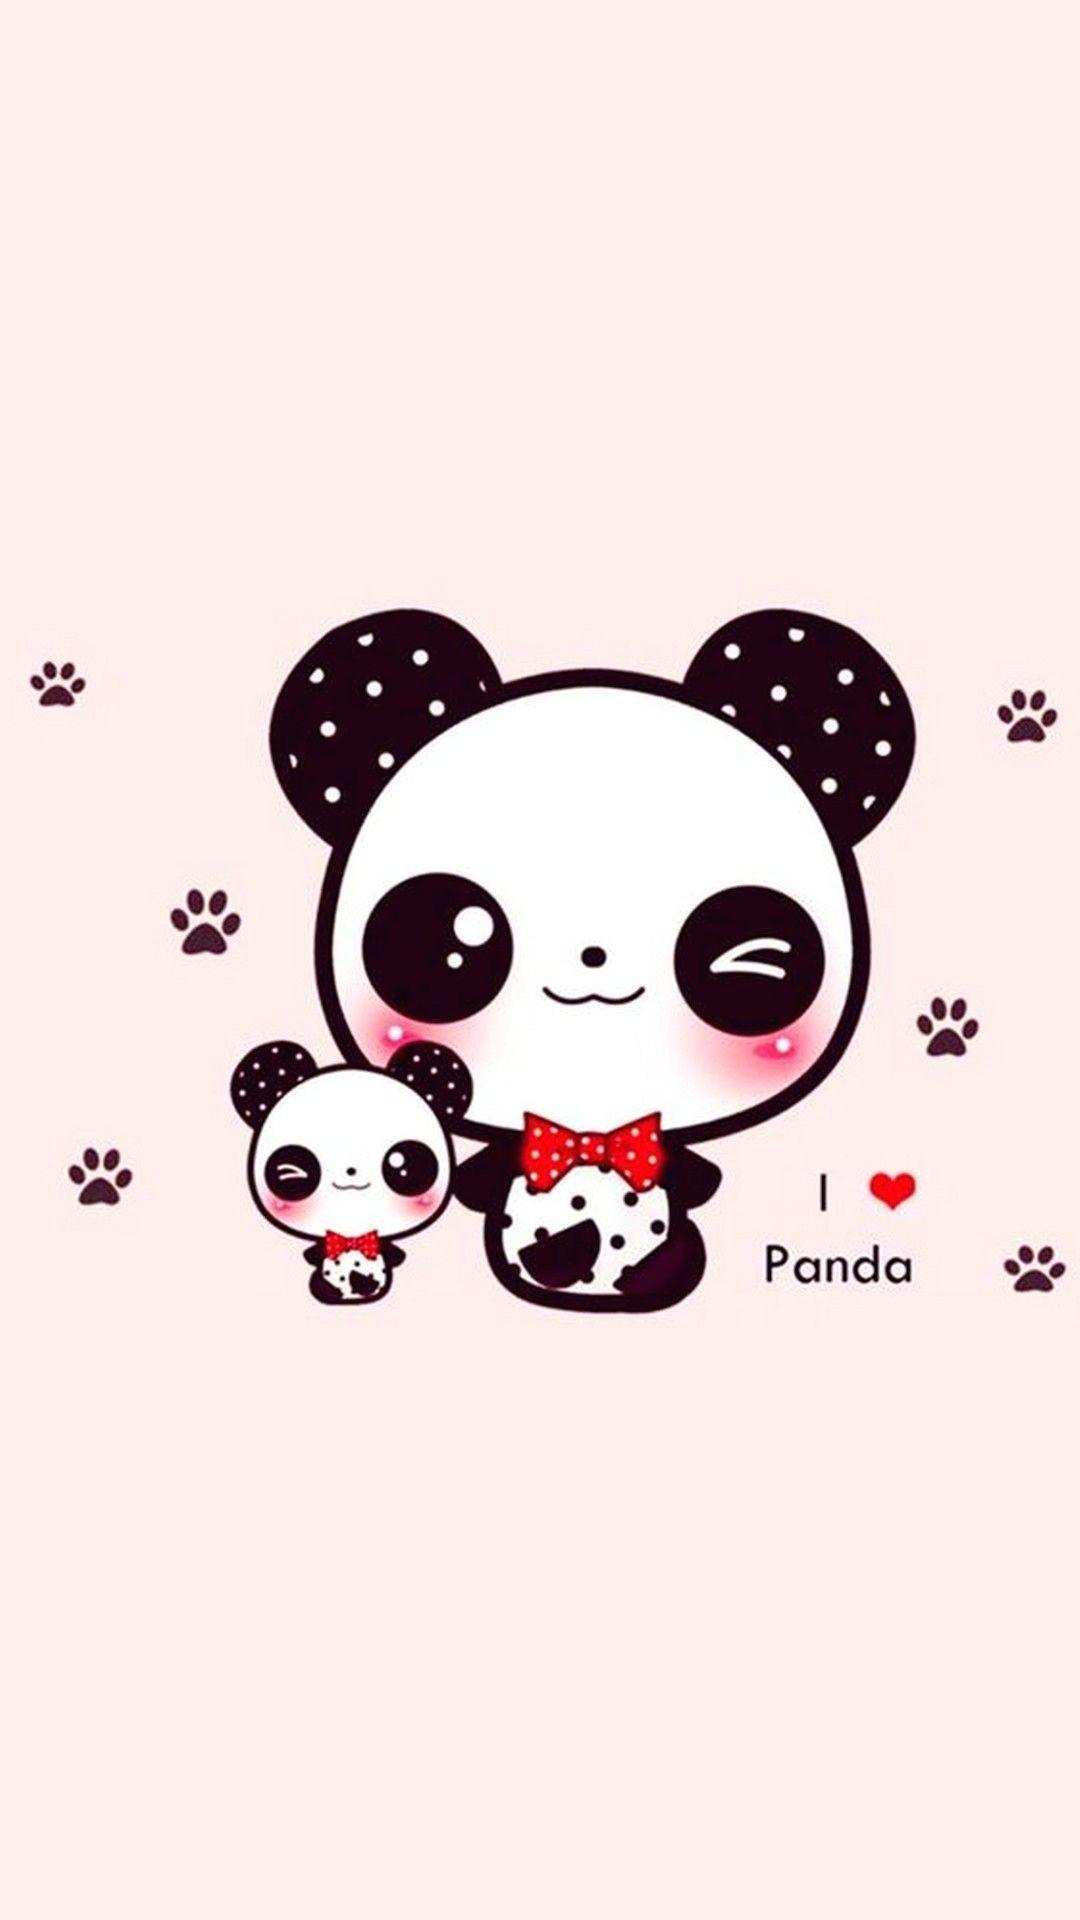 cute panda wallpaper for iphone best iphone wallpaper